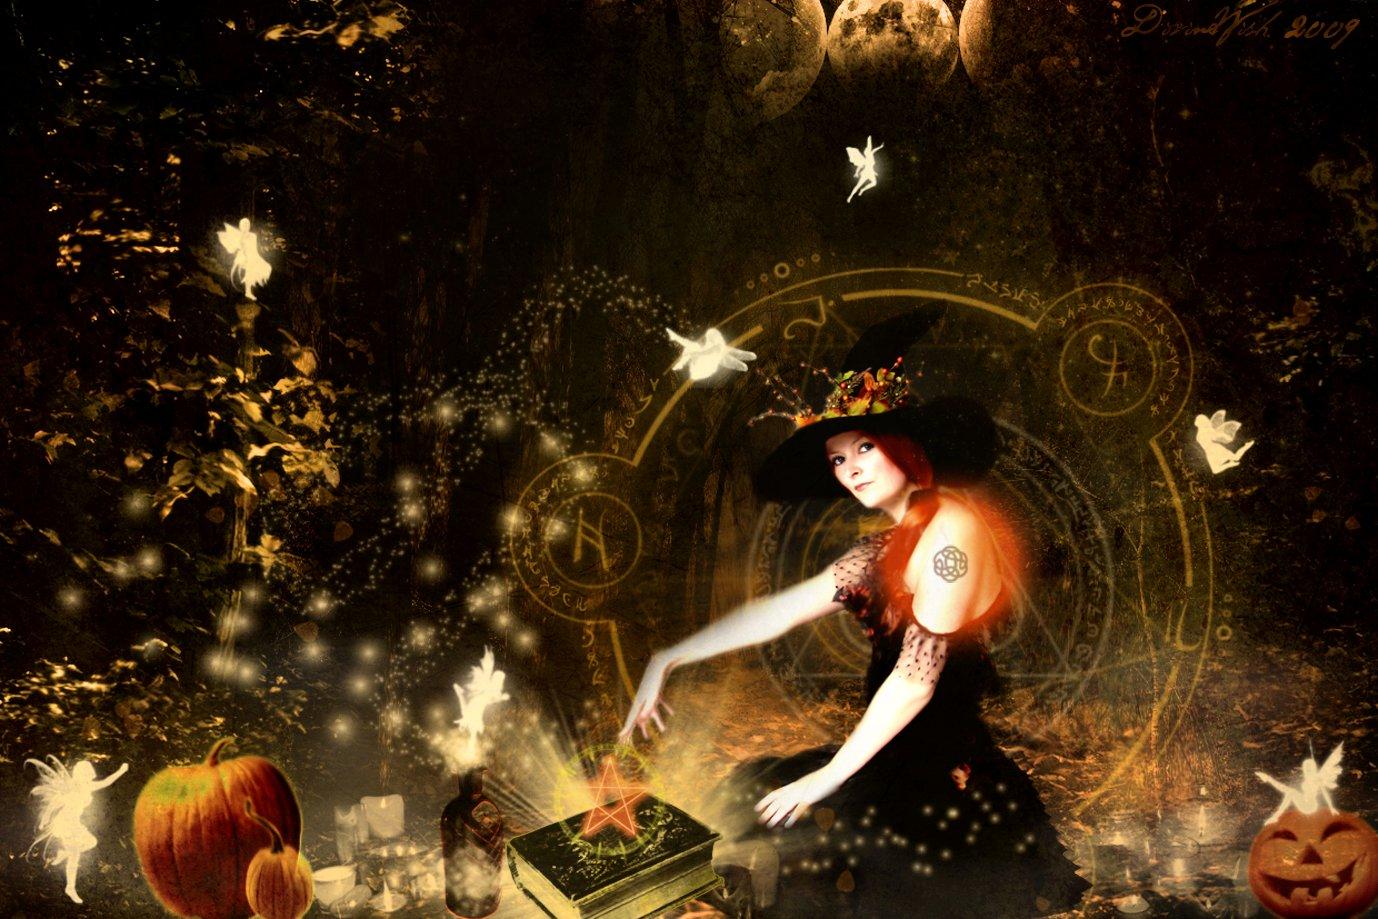 comfs51f2009275b7A Wiccan Halloween by DivineWishjpg 1378x919